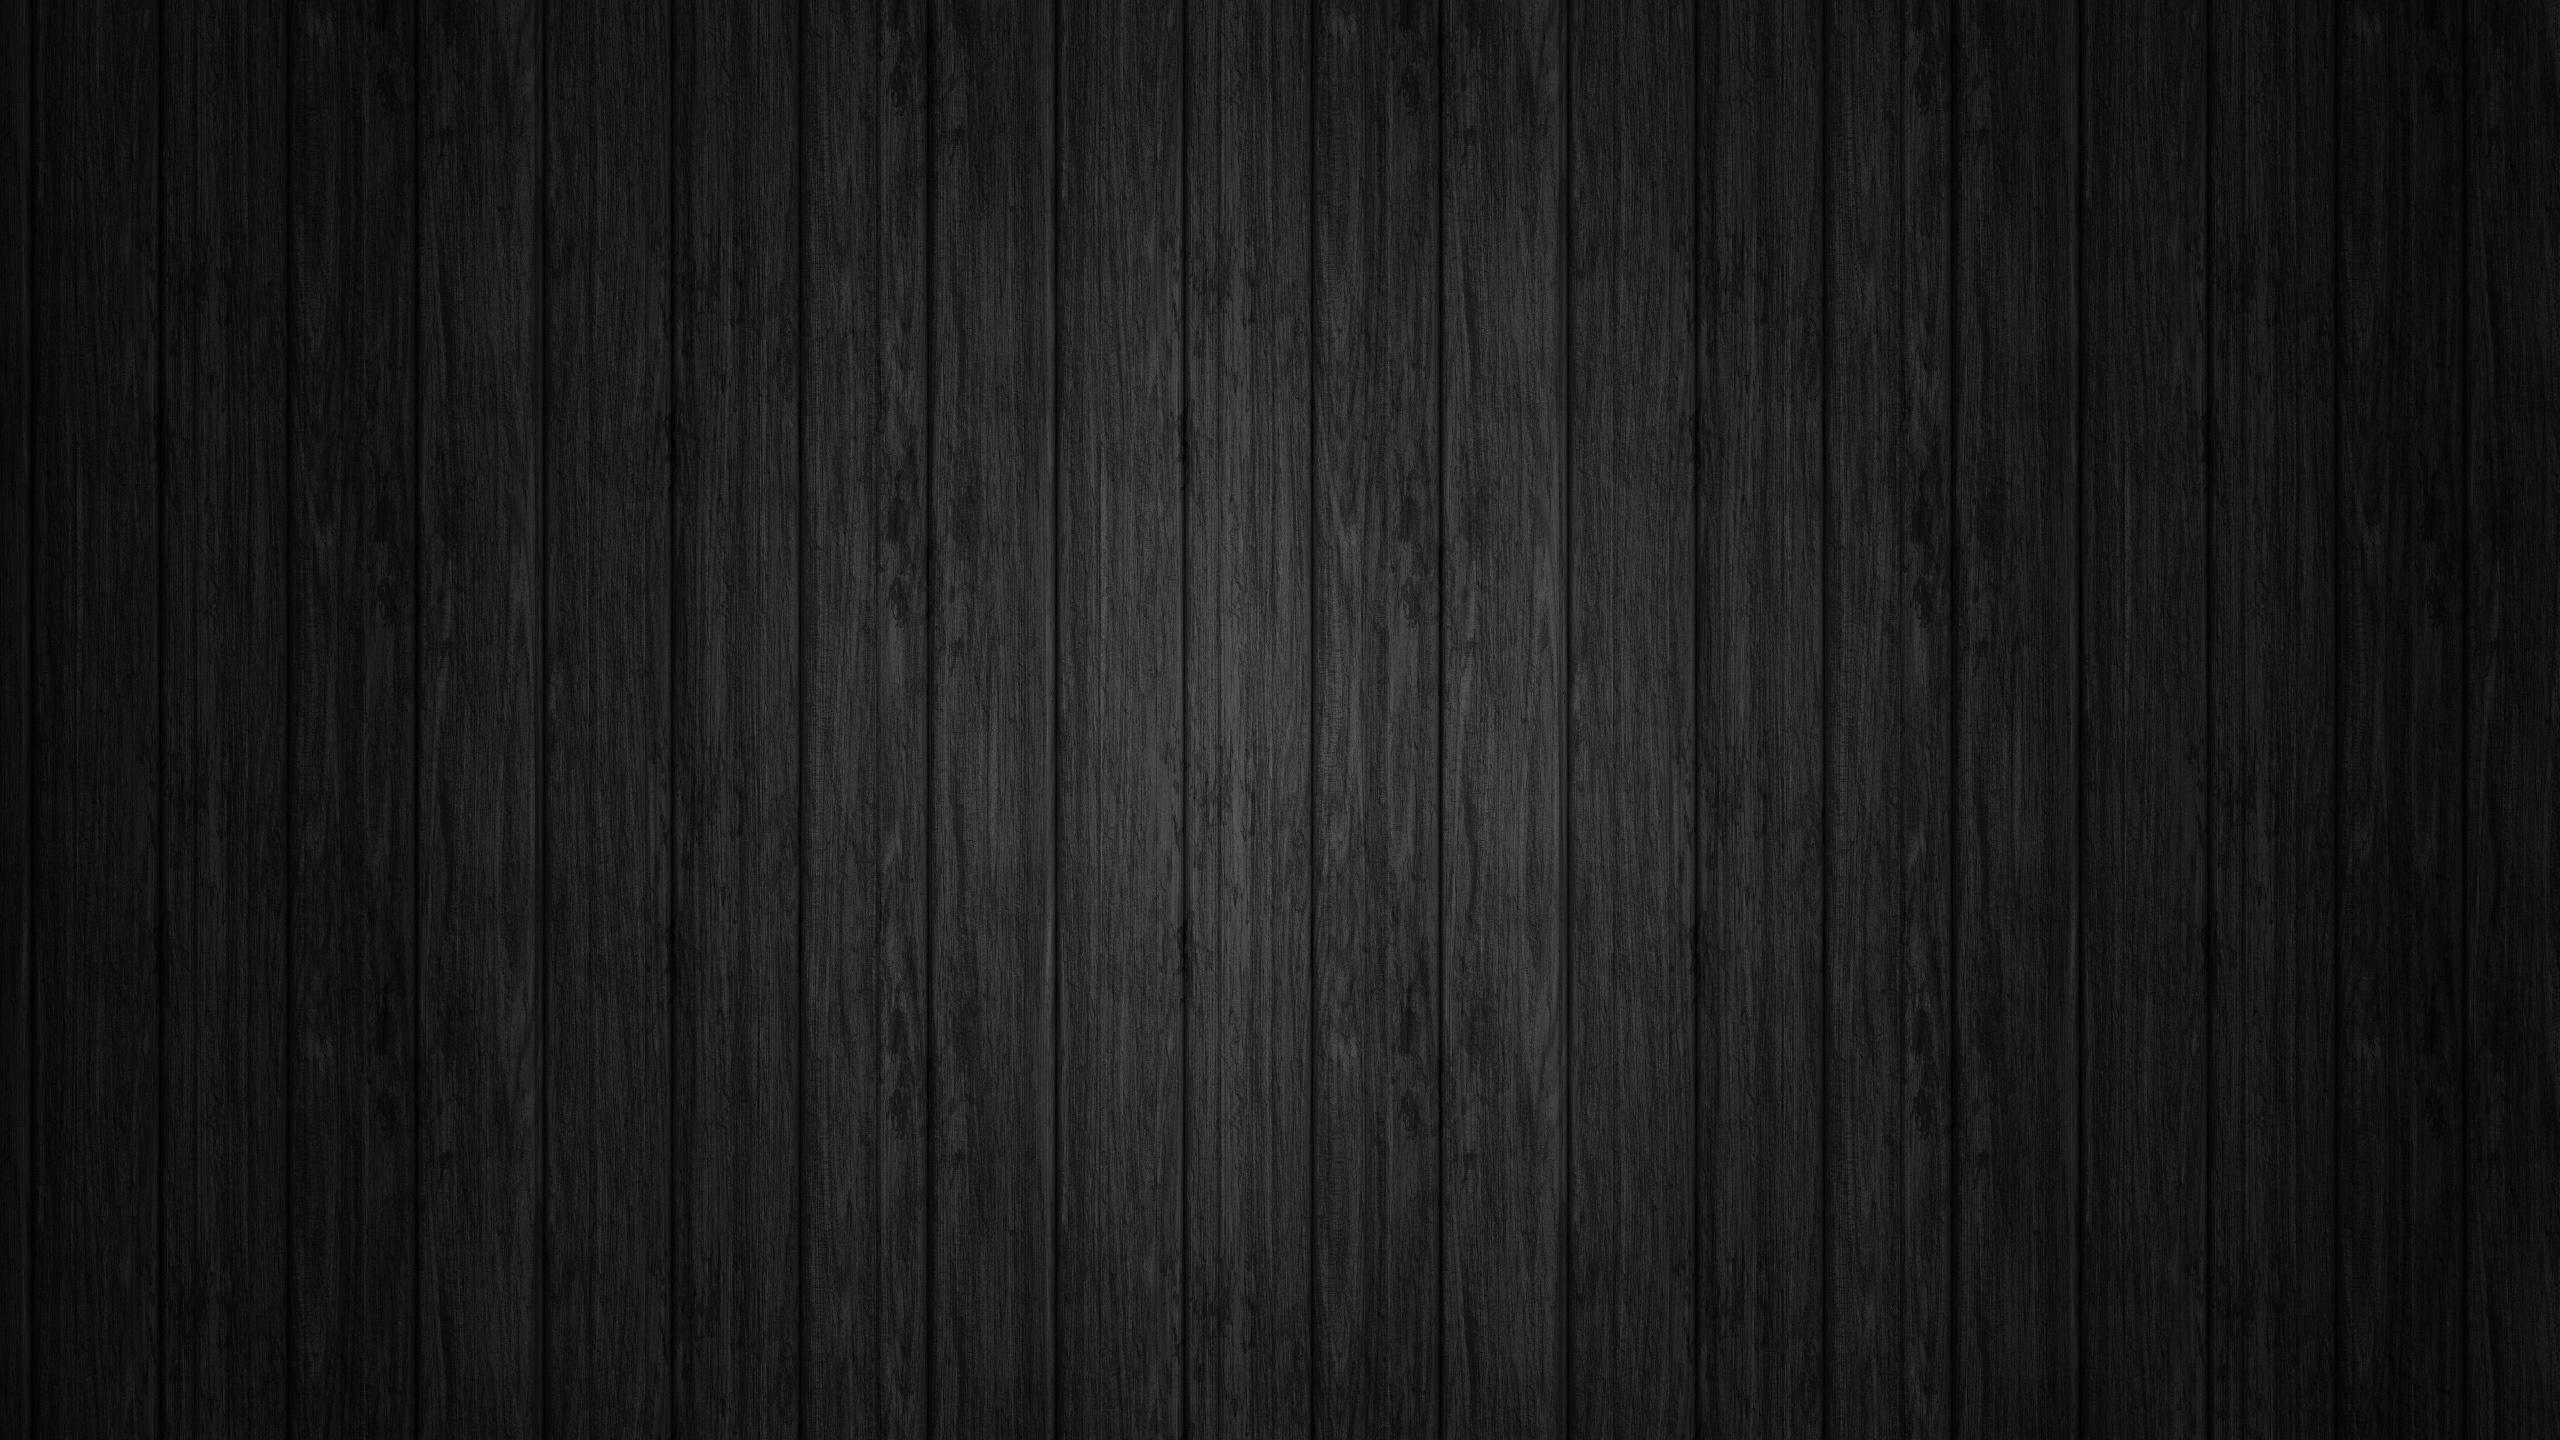 tumblr static tumblr static black background wood 2560x1440 by starlyz 2560x1440